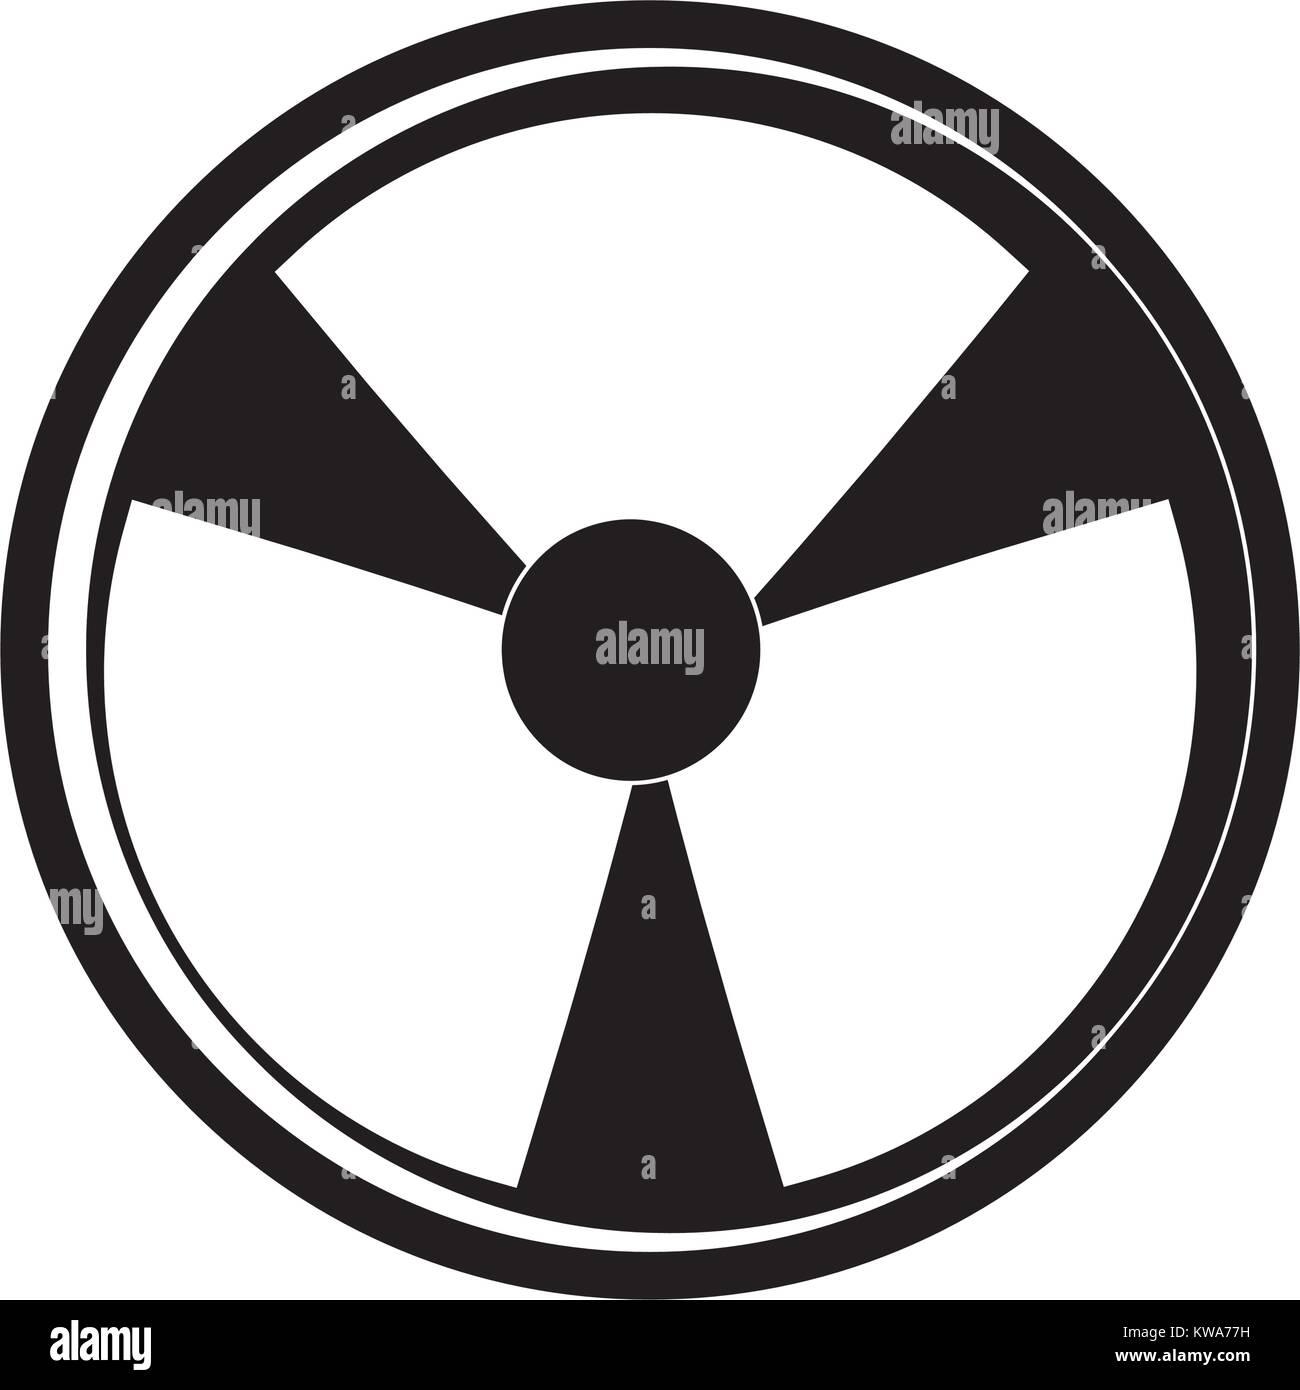 Nuclear Hazard Symbols